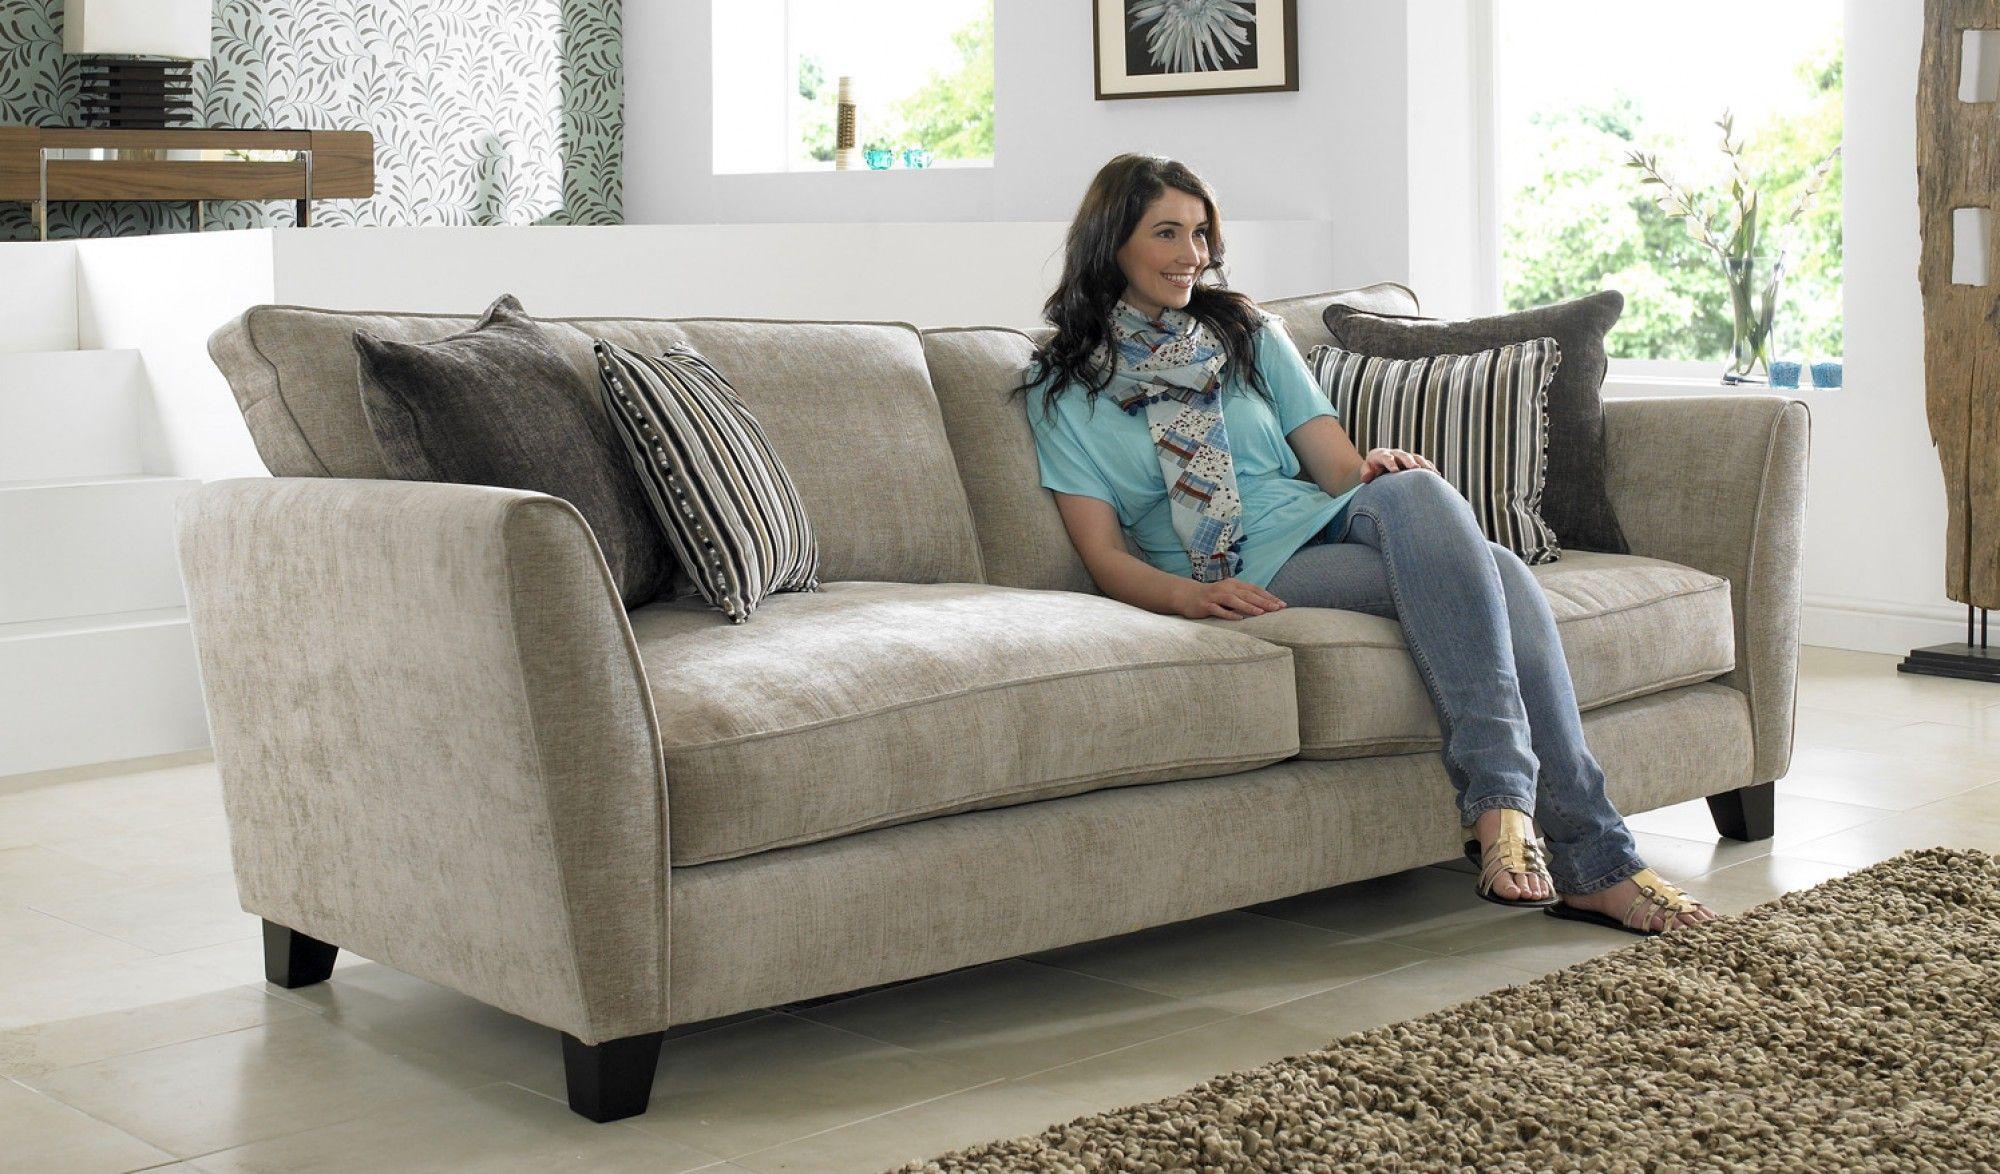 Admirable Fabric Sofas Canterbury Csl Sofas Co Uk For The Home Creativecarmelina Interior Chair Design Creativecarmelinacom